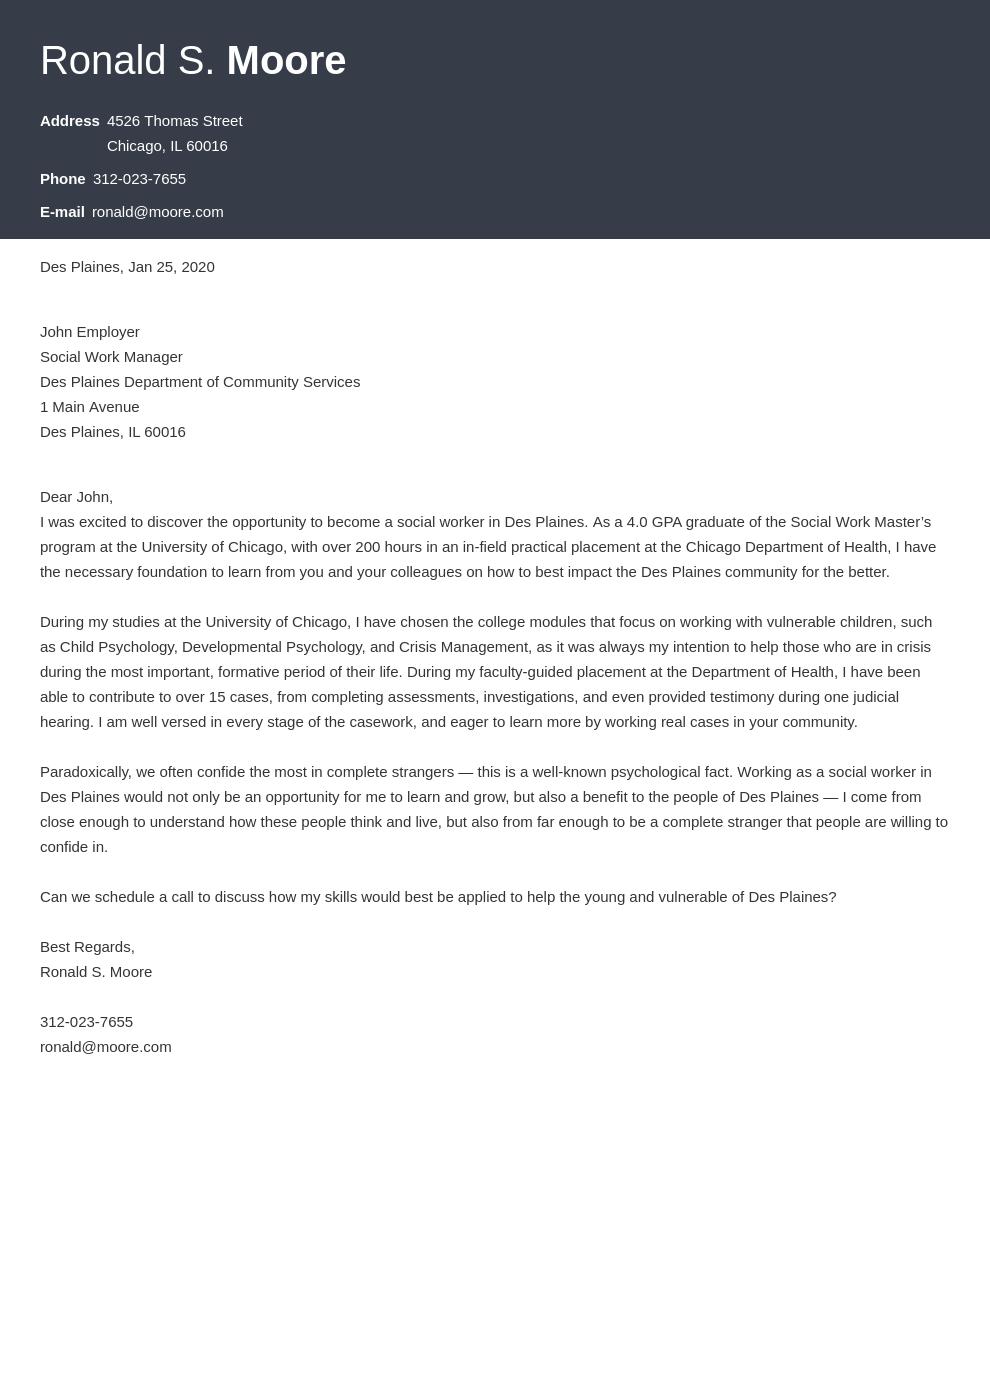 cover letter examples social work template diamond uk